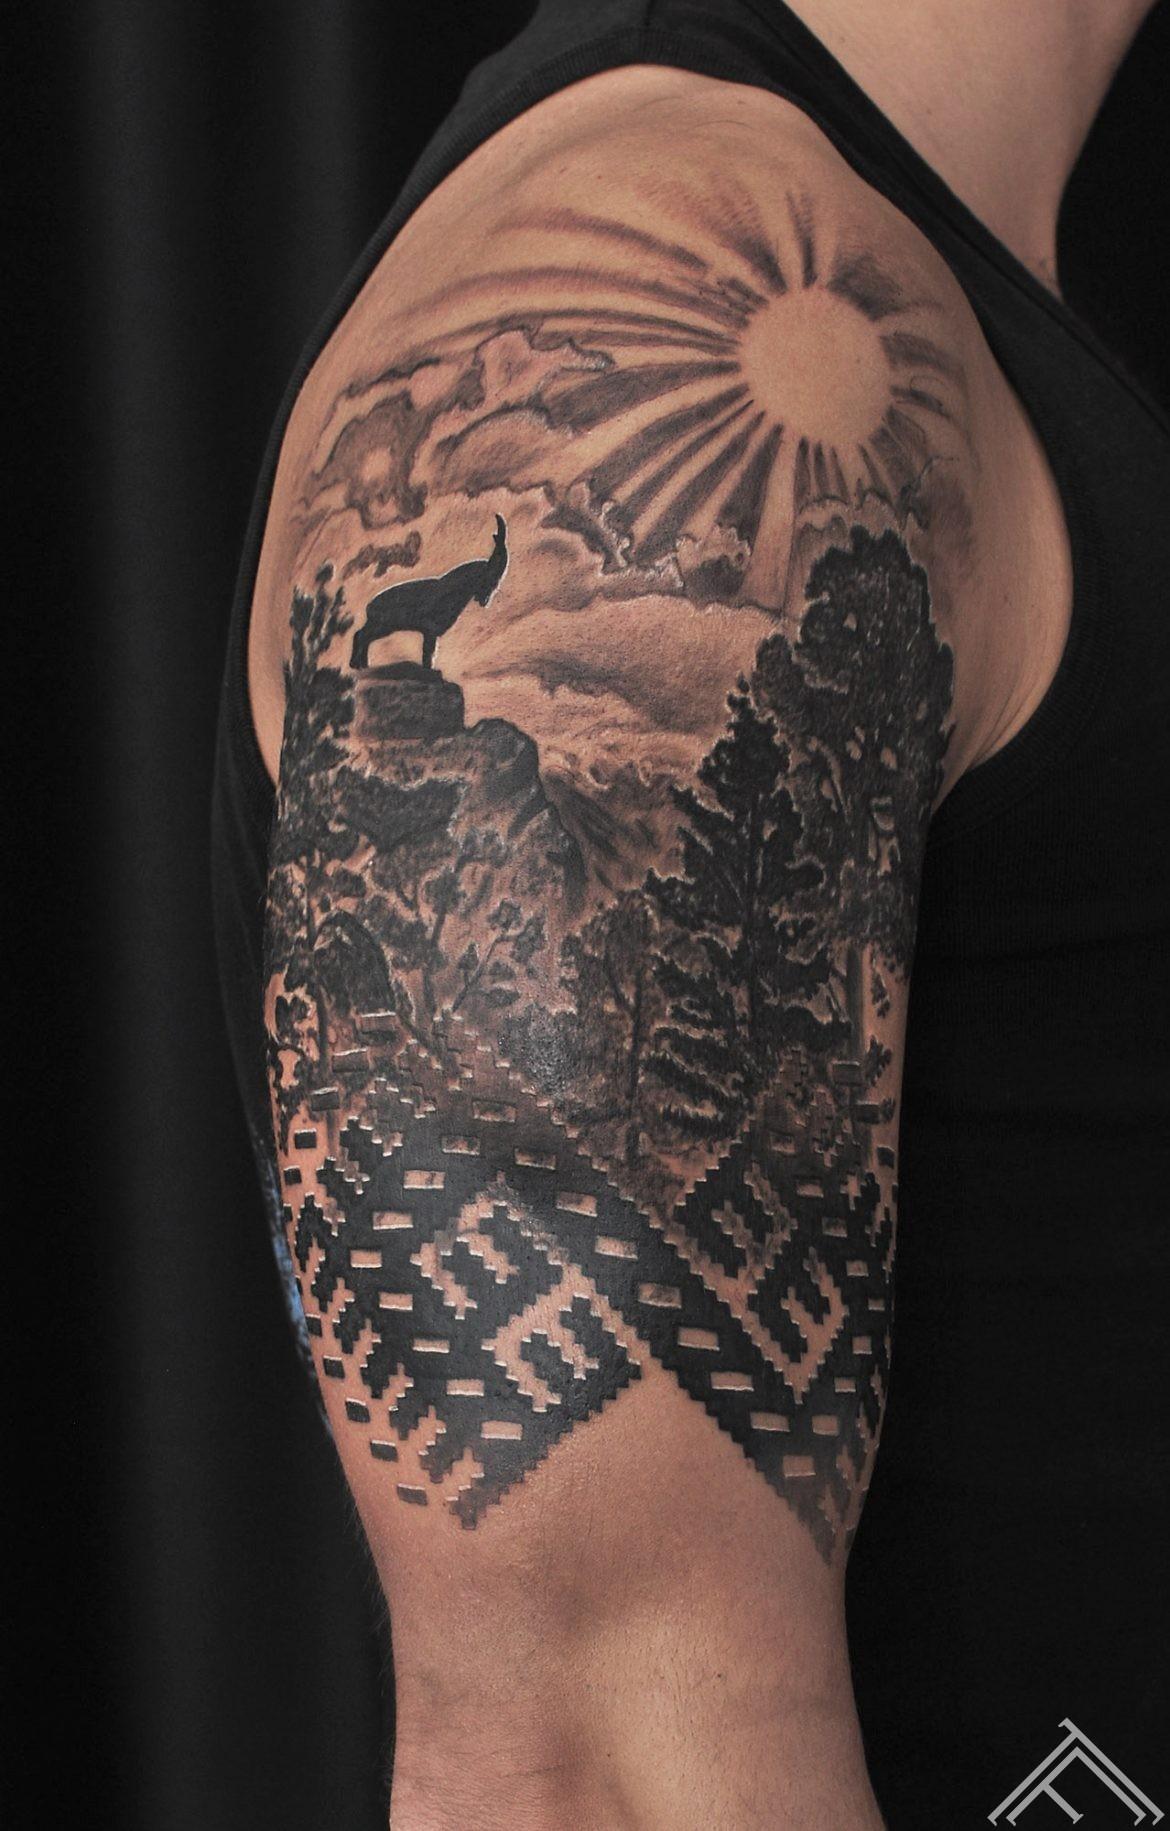 latviesu simboli-tattoo-tattoofrequency-riga-studija-salons-tetovesana-janisandersons